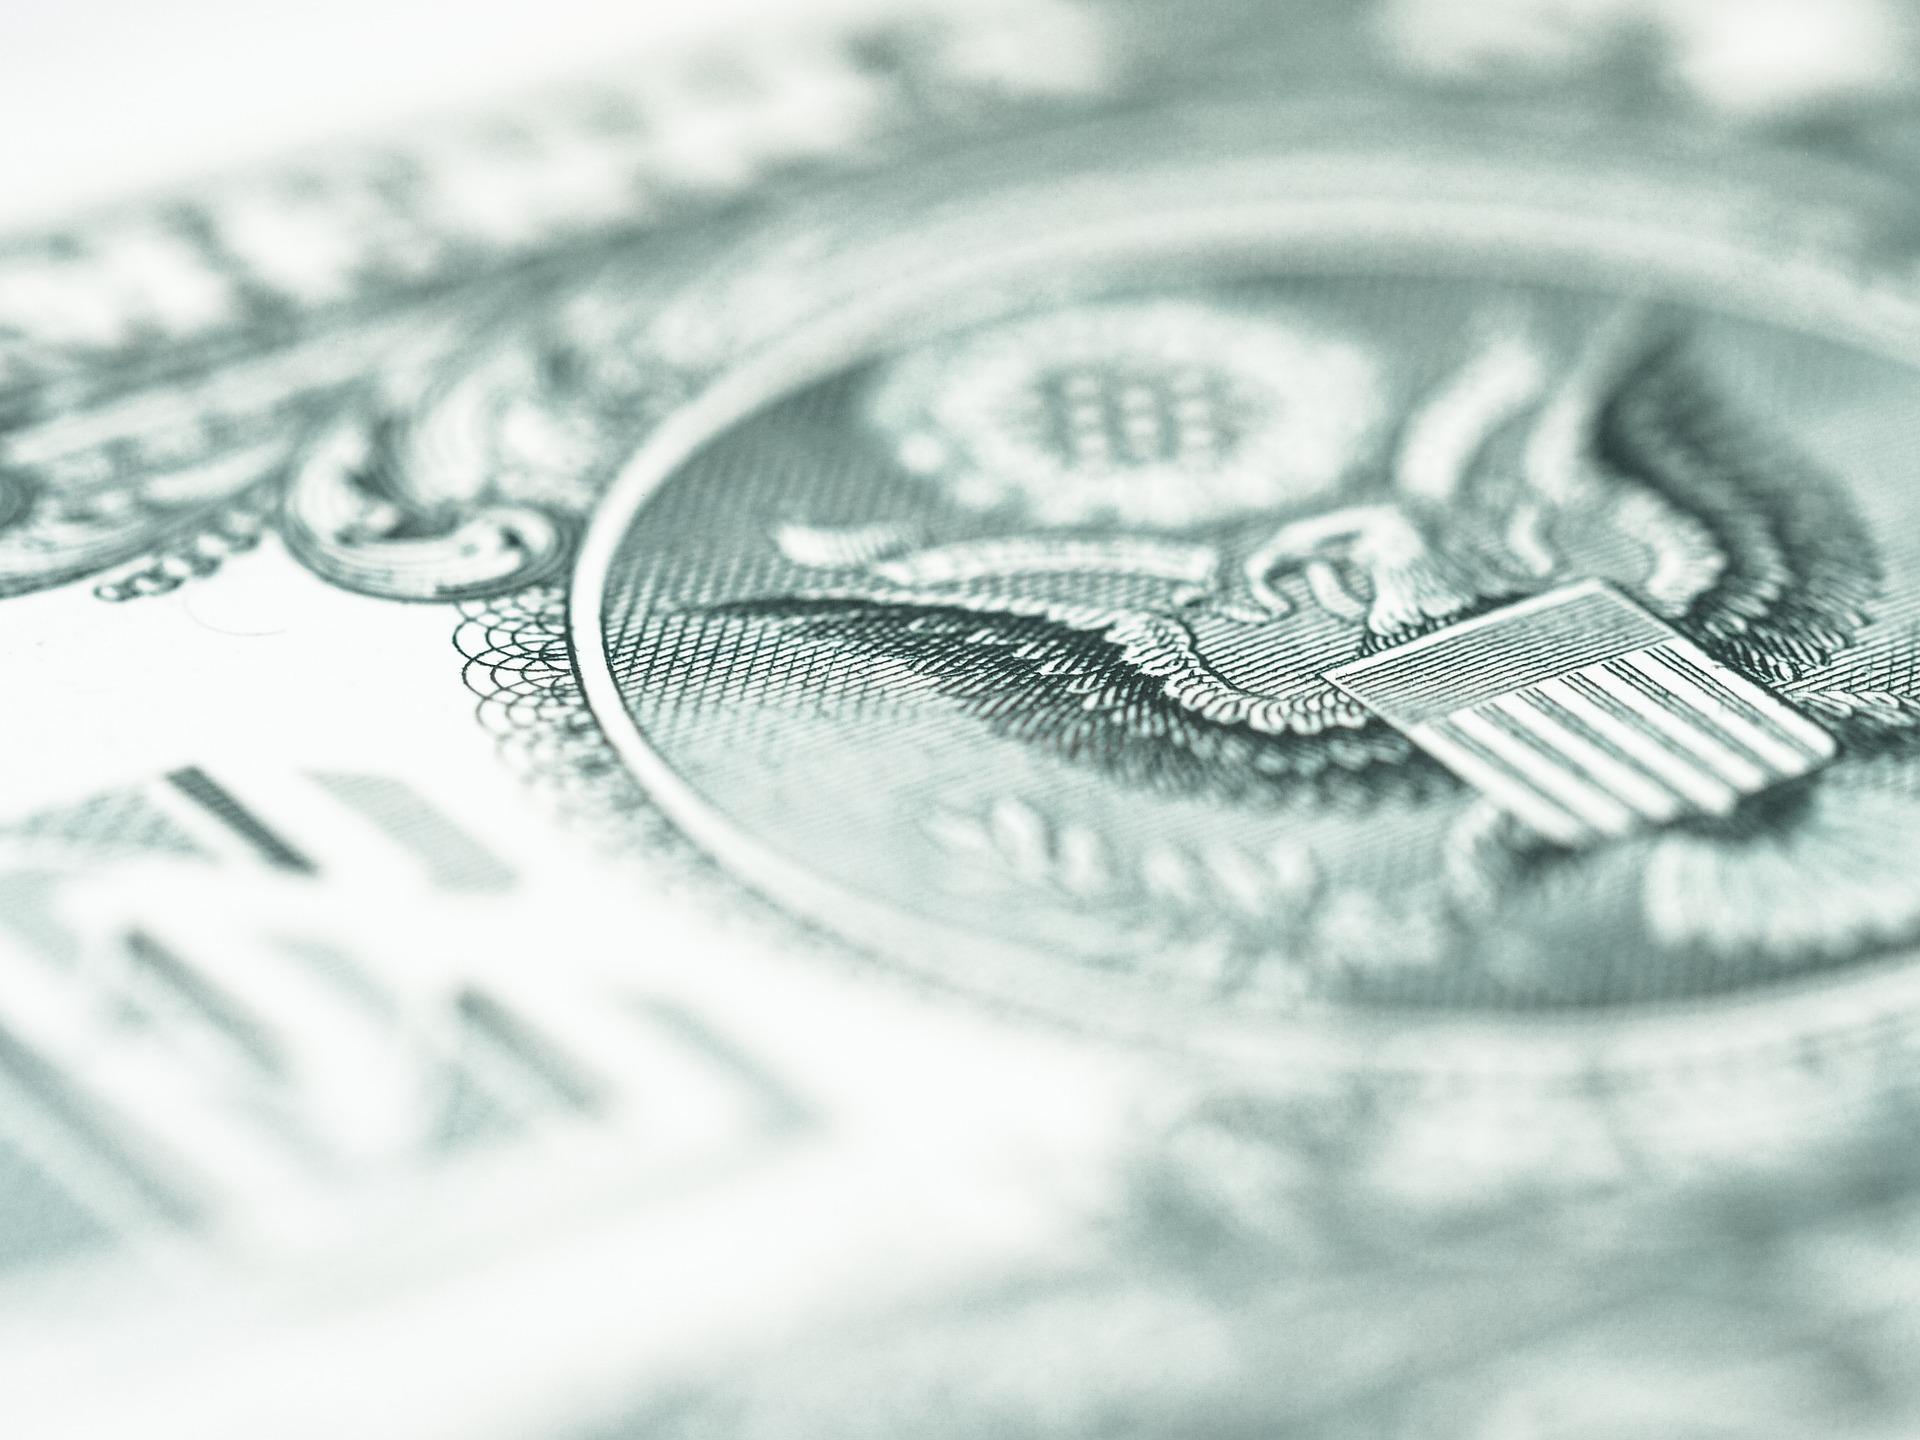 Dollar Representing Wealth